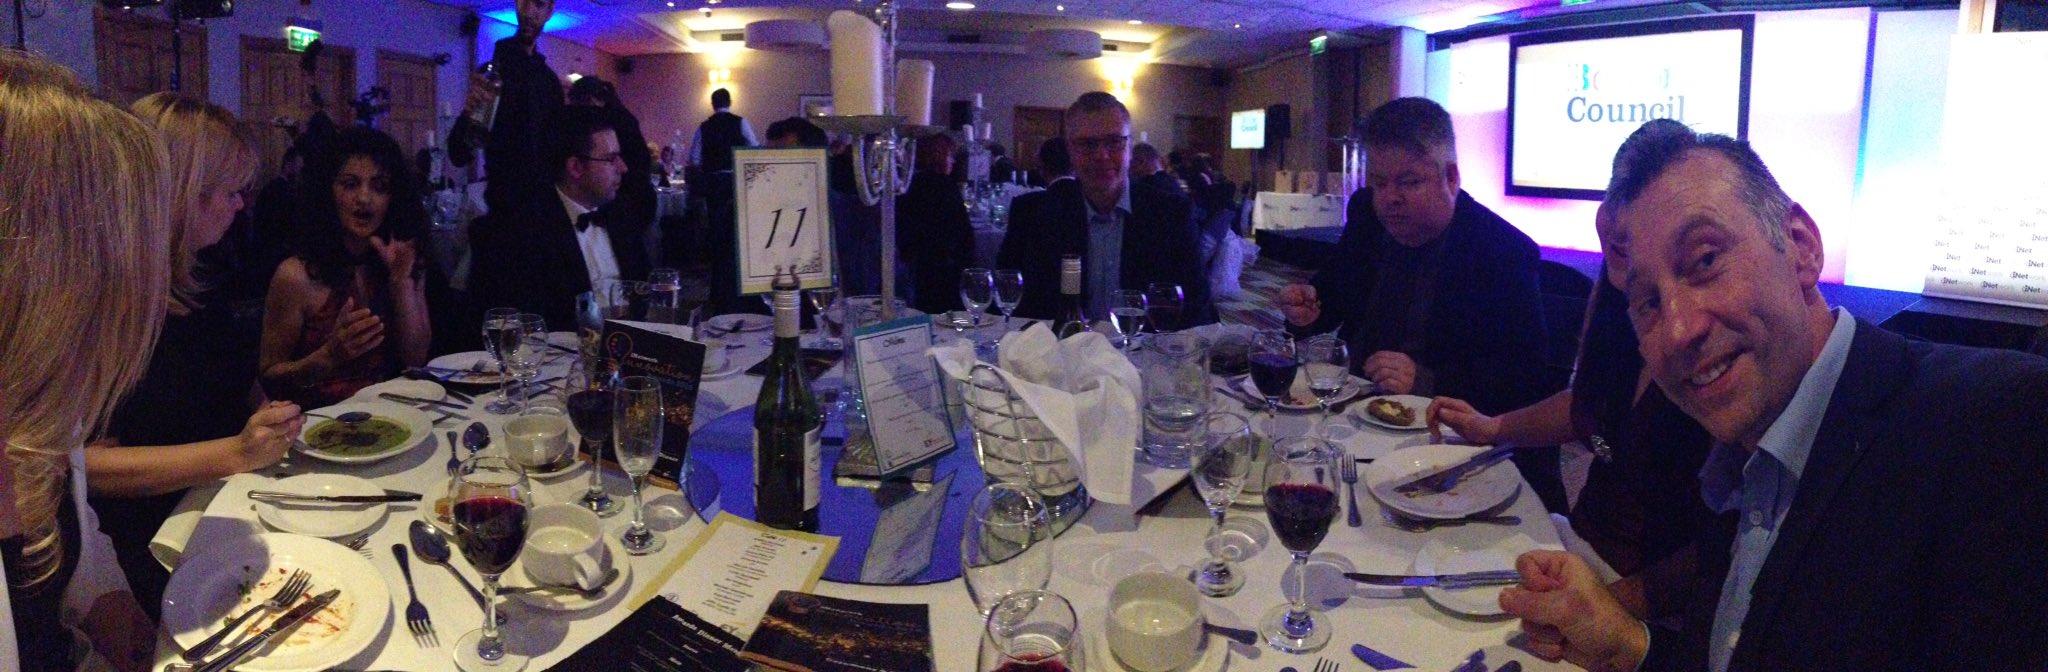 I'm on the best table tonight #inetworkawards https://t.co/JPFCiPqLgh